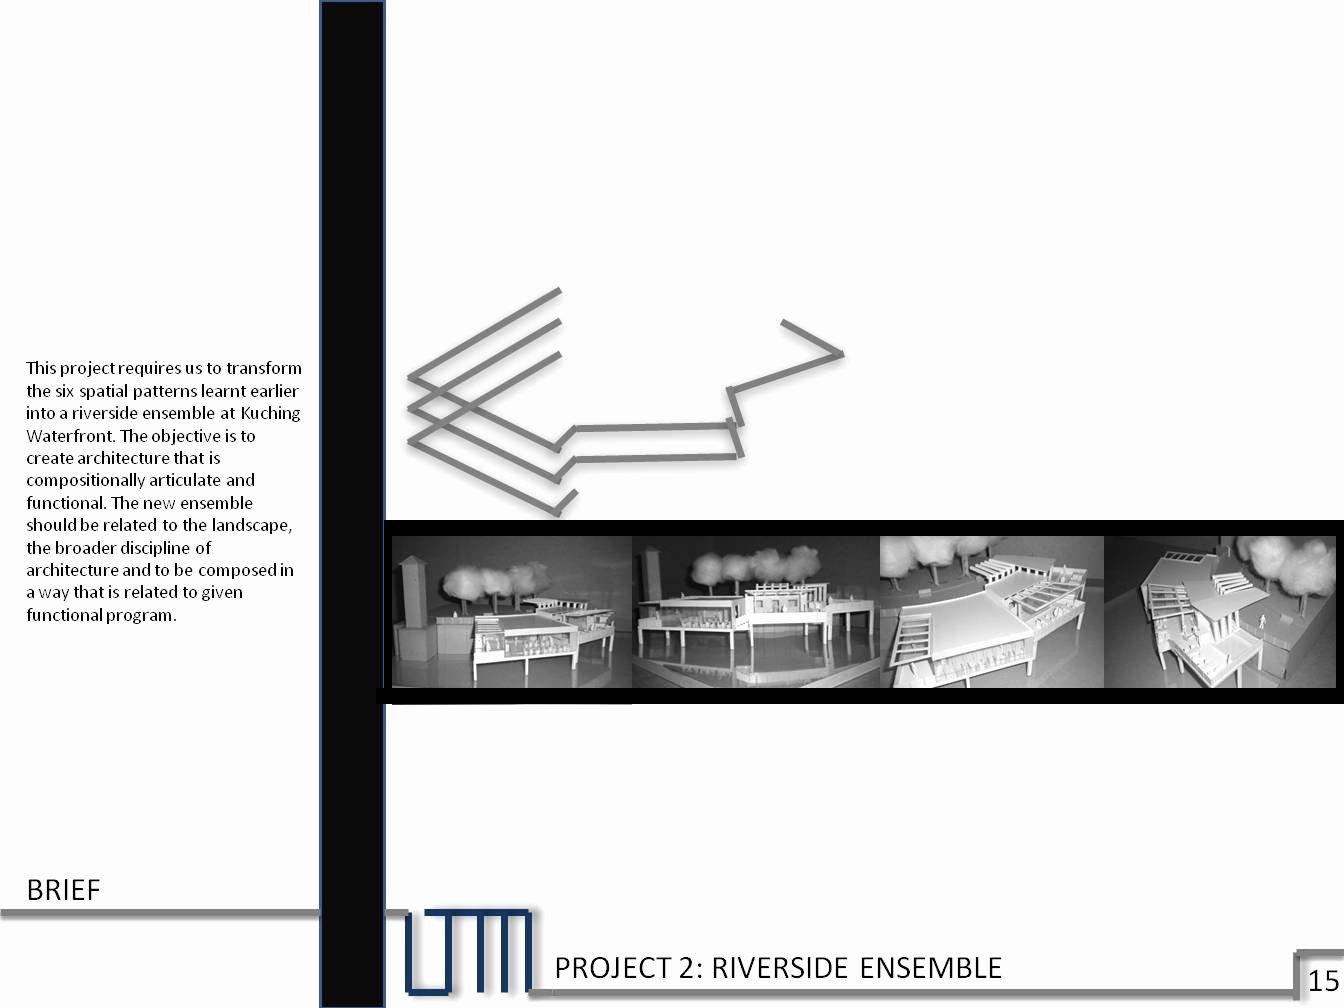 Architecture Portfolio Template Indesign Best Of Architecture Villa Image Architecture Portfolio Layout